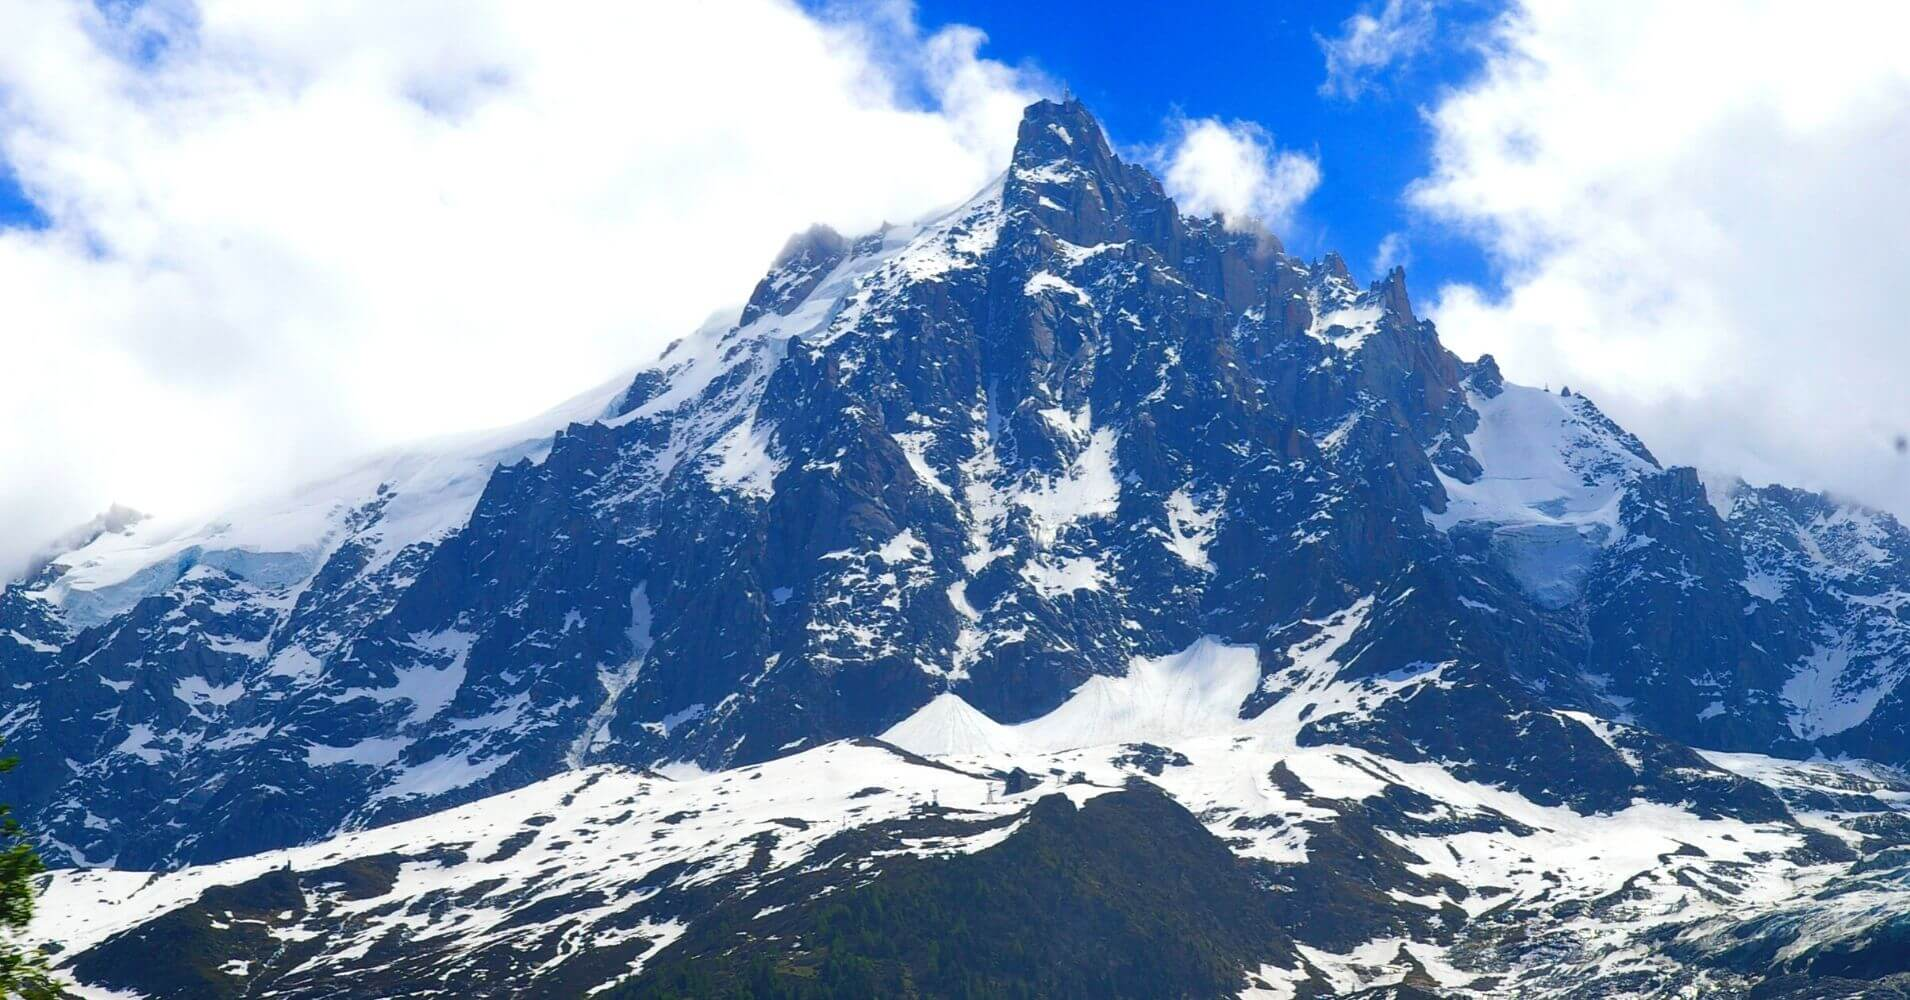 Aiguille du Midi. Cordillera de los Alpes. Chamonix, Francia.